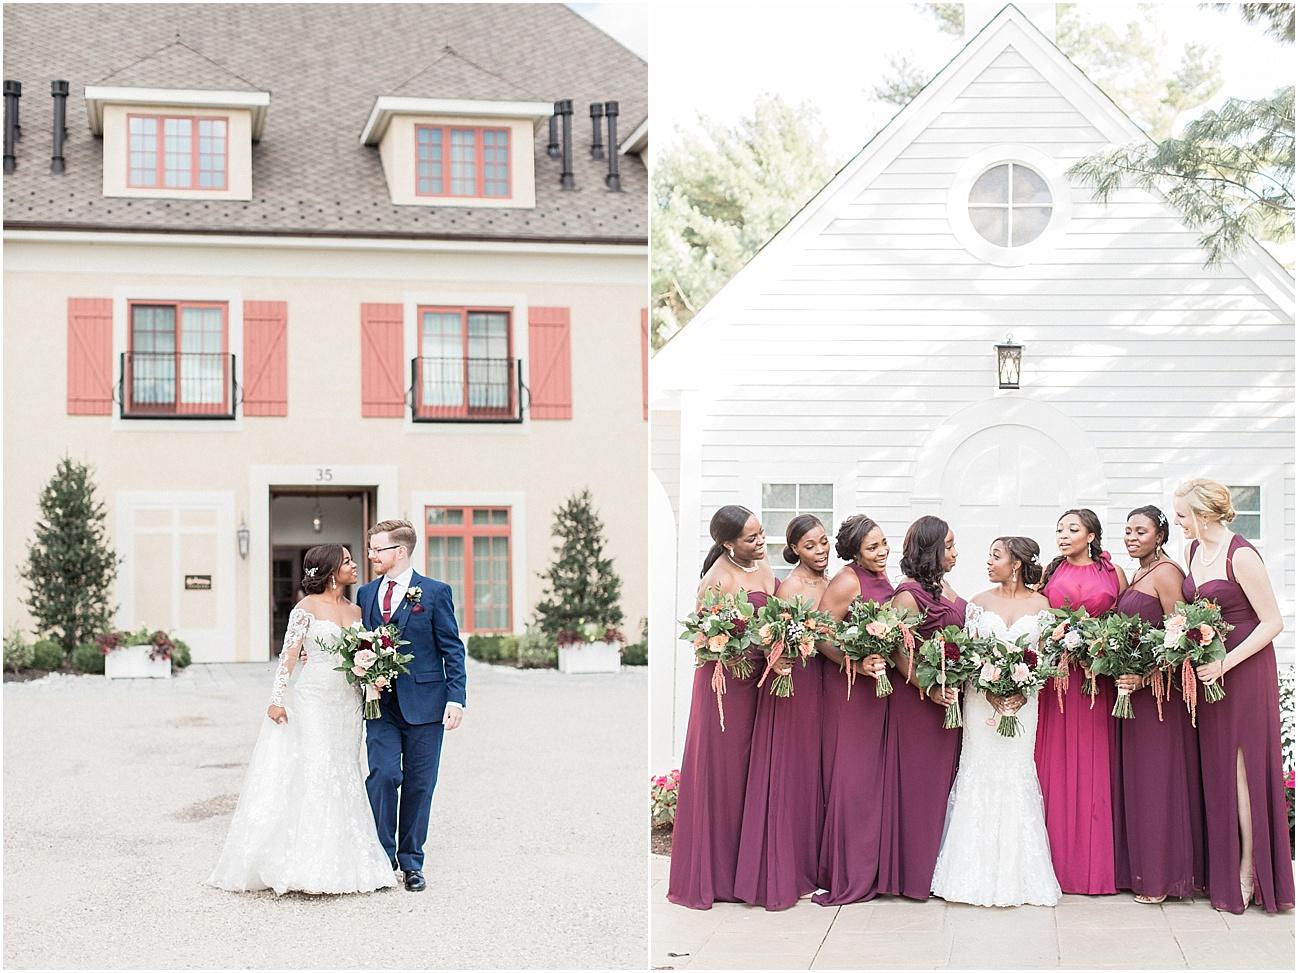 melissa_dan_the_pavilion_at_pine_hills_fall_wine_cape_cod_boston_wedding_photographer_meredith_jane_photography_photo_1183.jpg